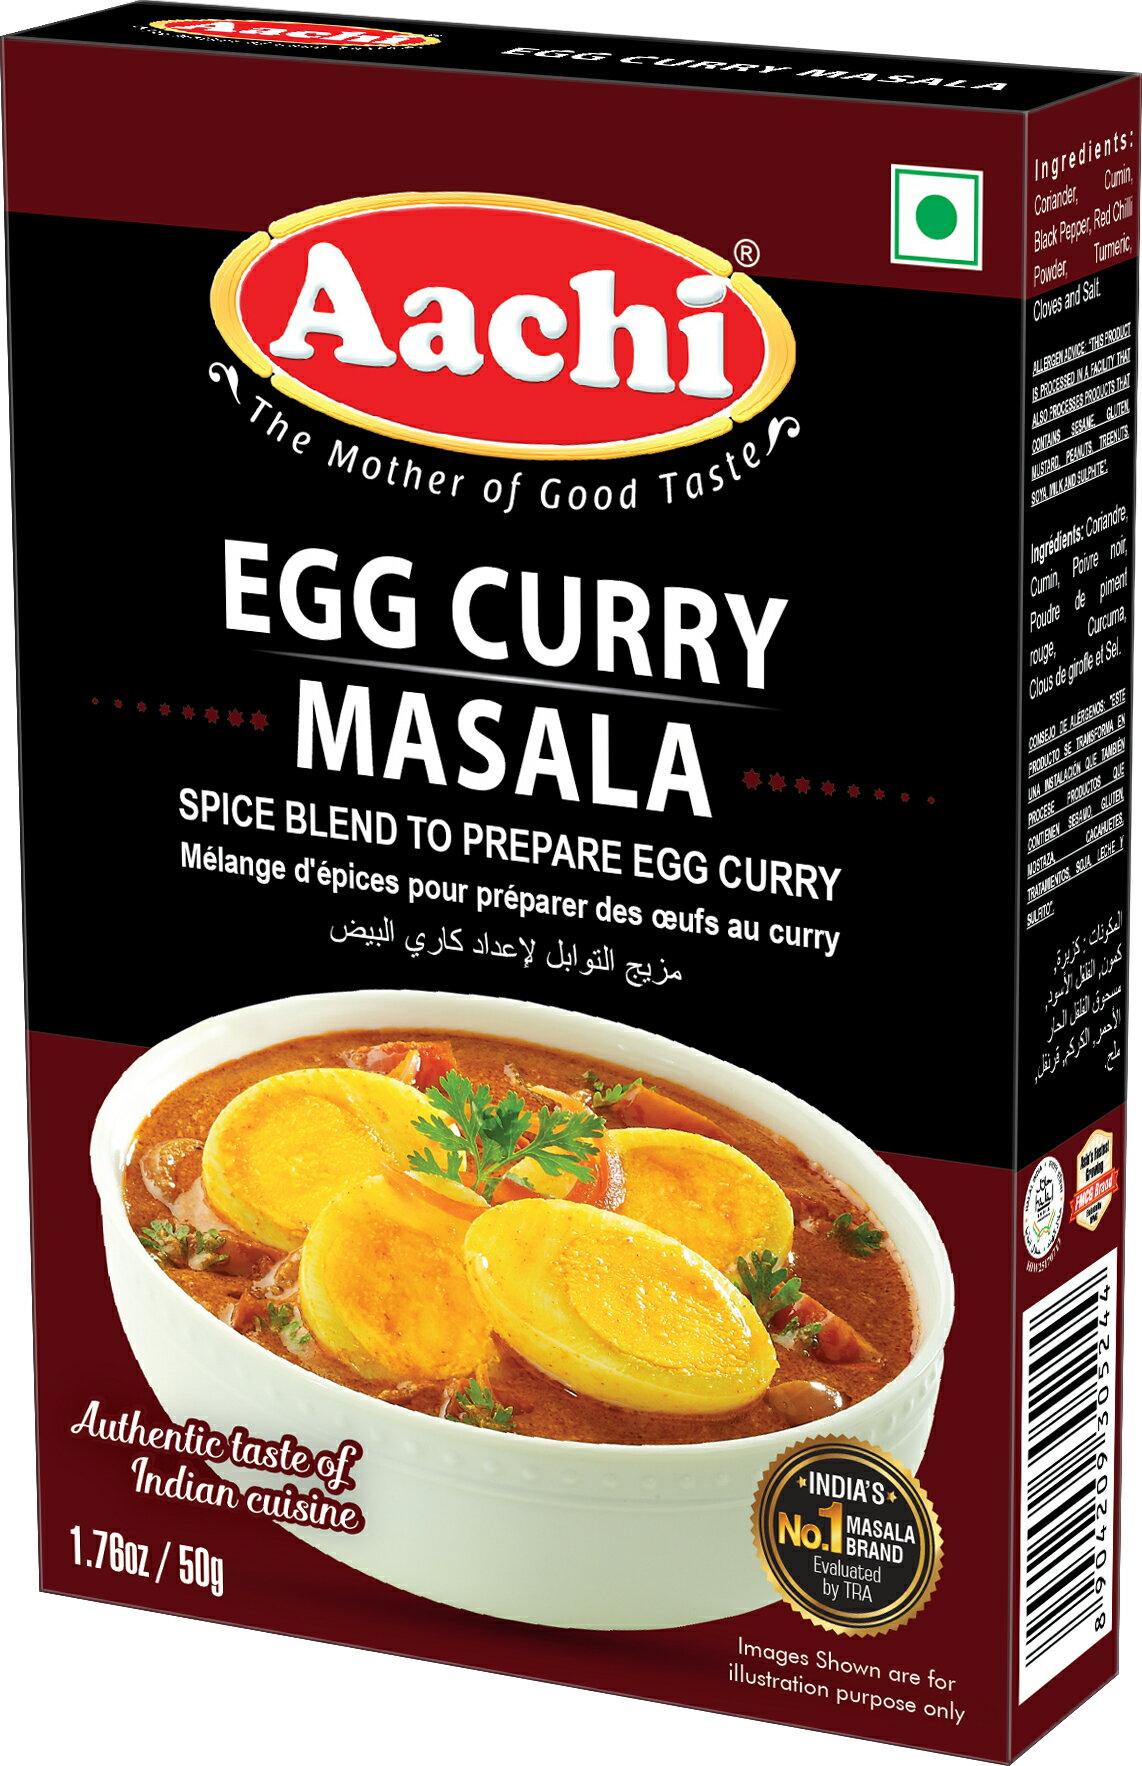 雞蛋咖哩粉  Egg Curry Masala AACHI 50gm